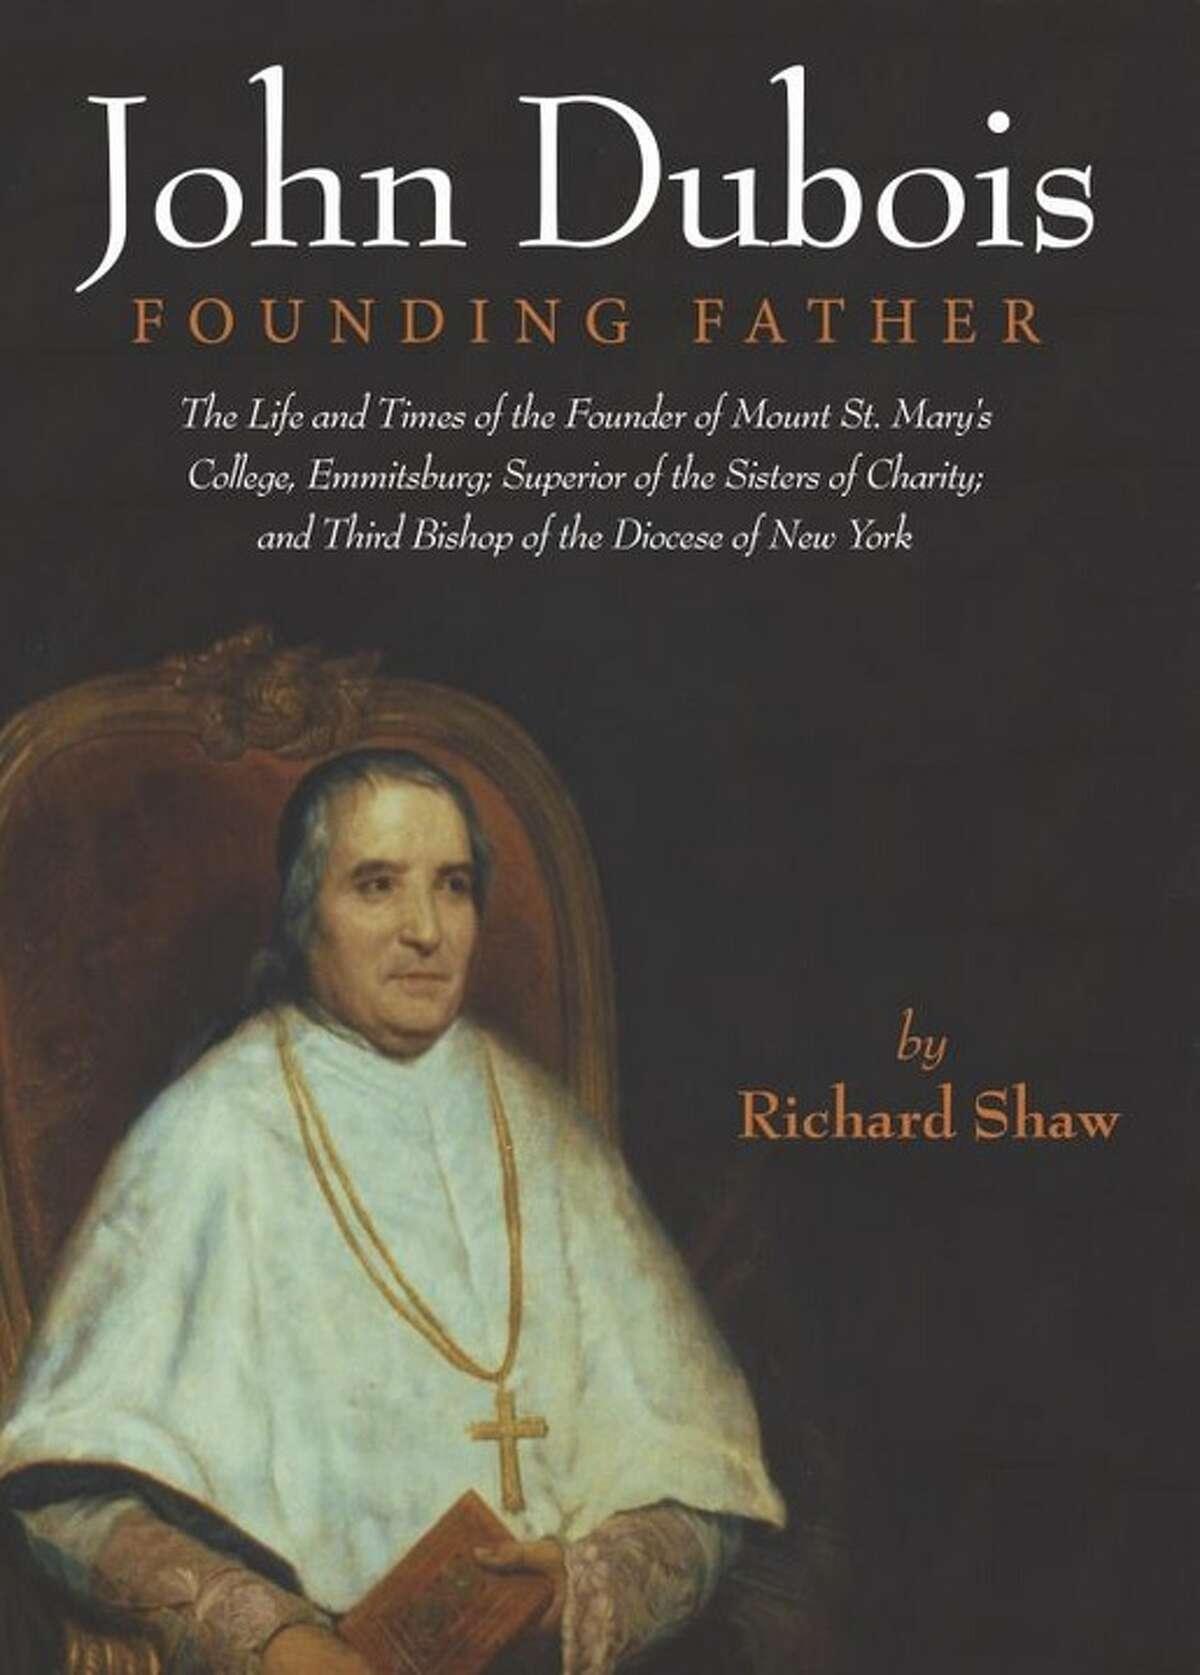 """John Dubois: Founding Father"" by Richard Shaw (Amazon.com)"